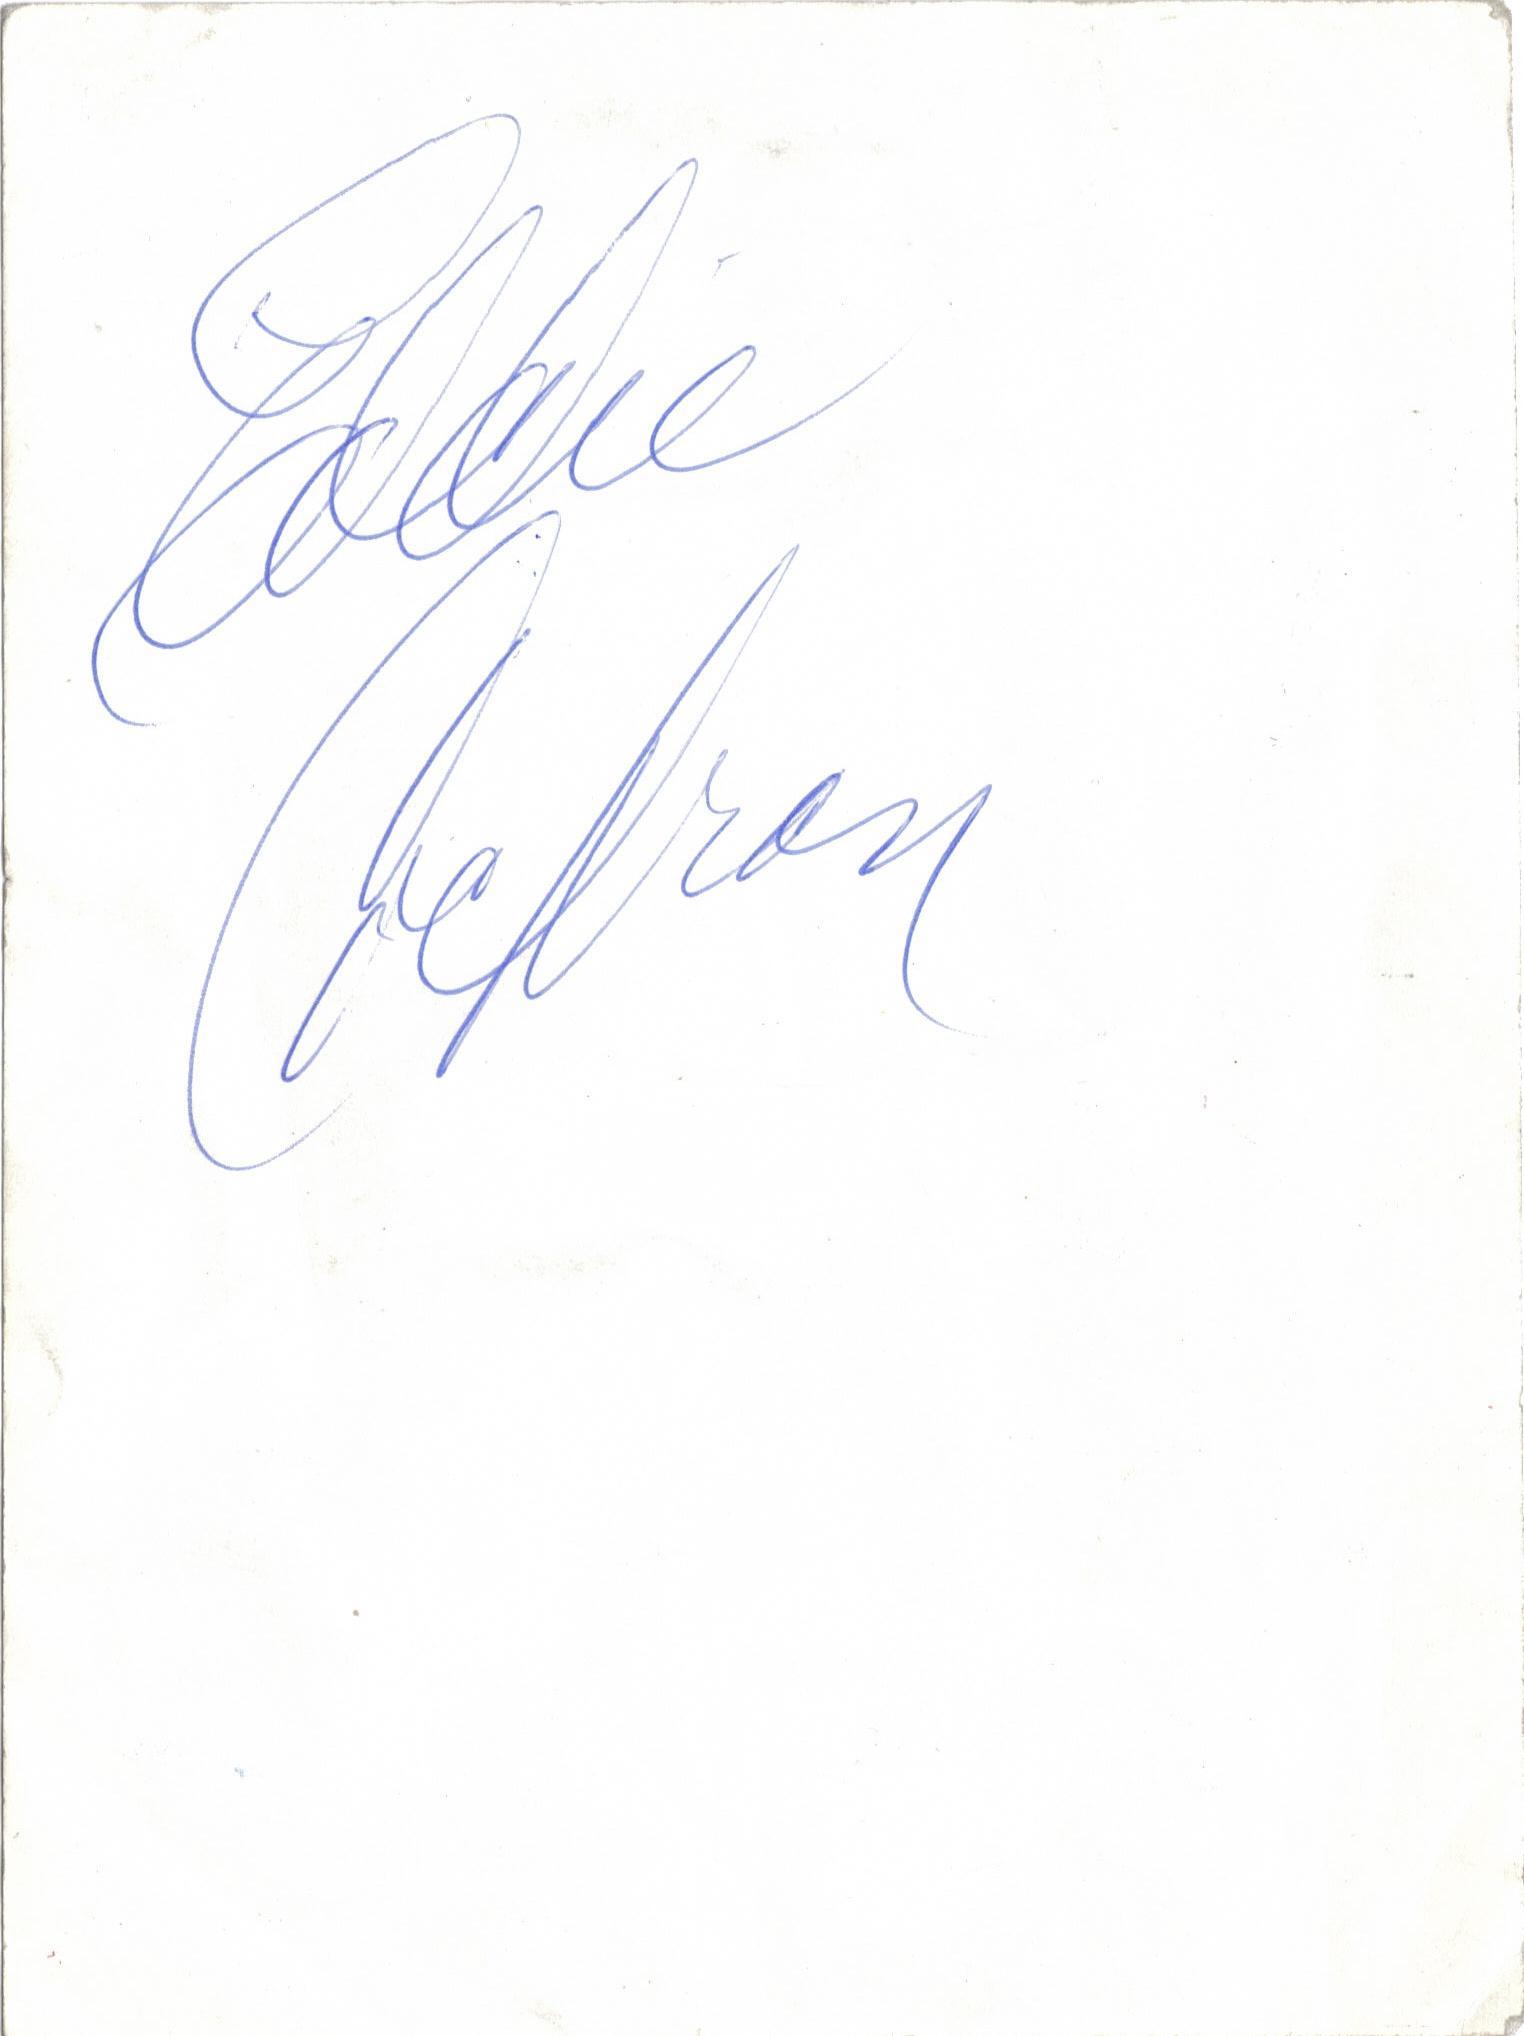 80584_Autograph_41_2_122_149lo.jpg